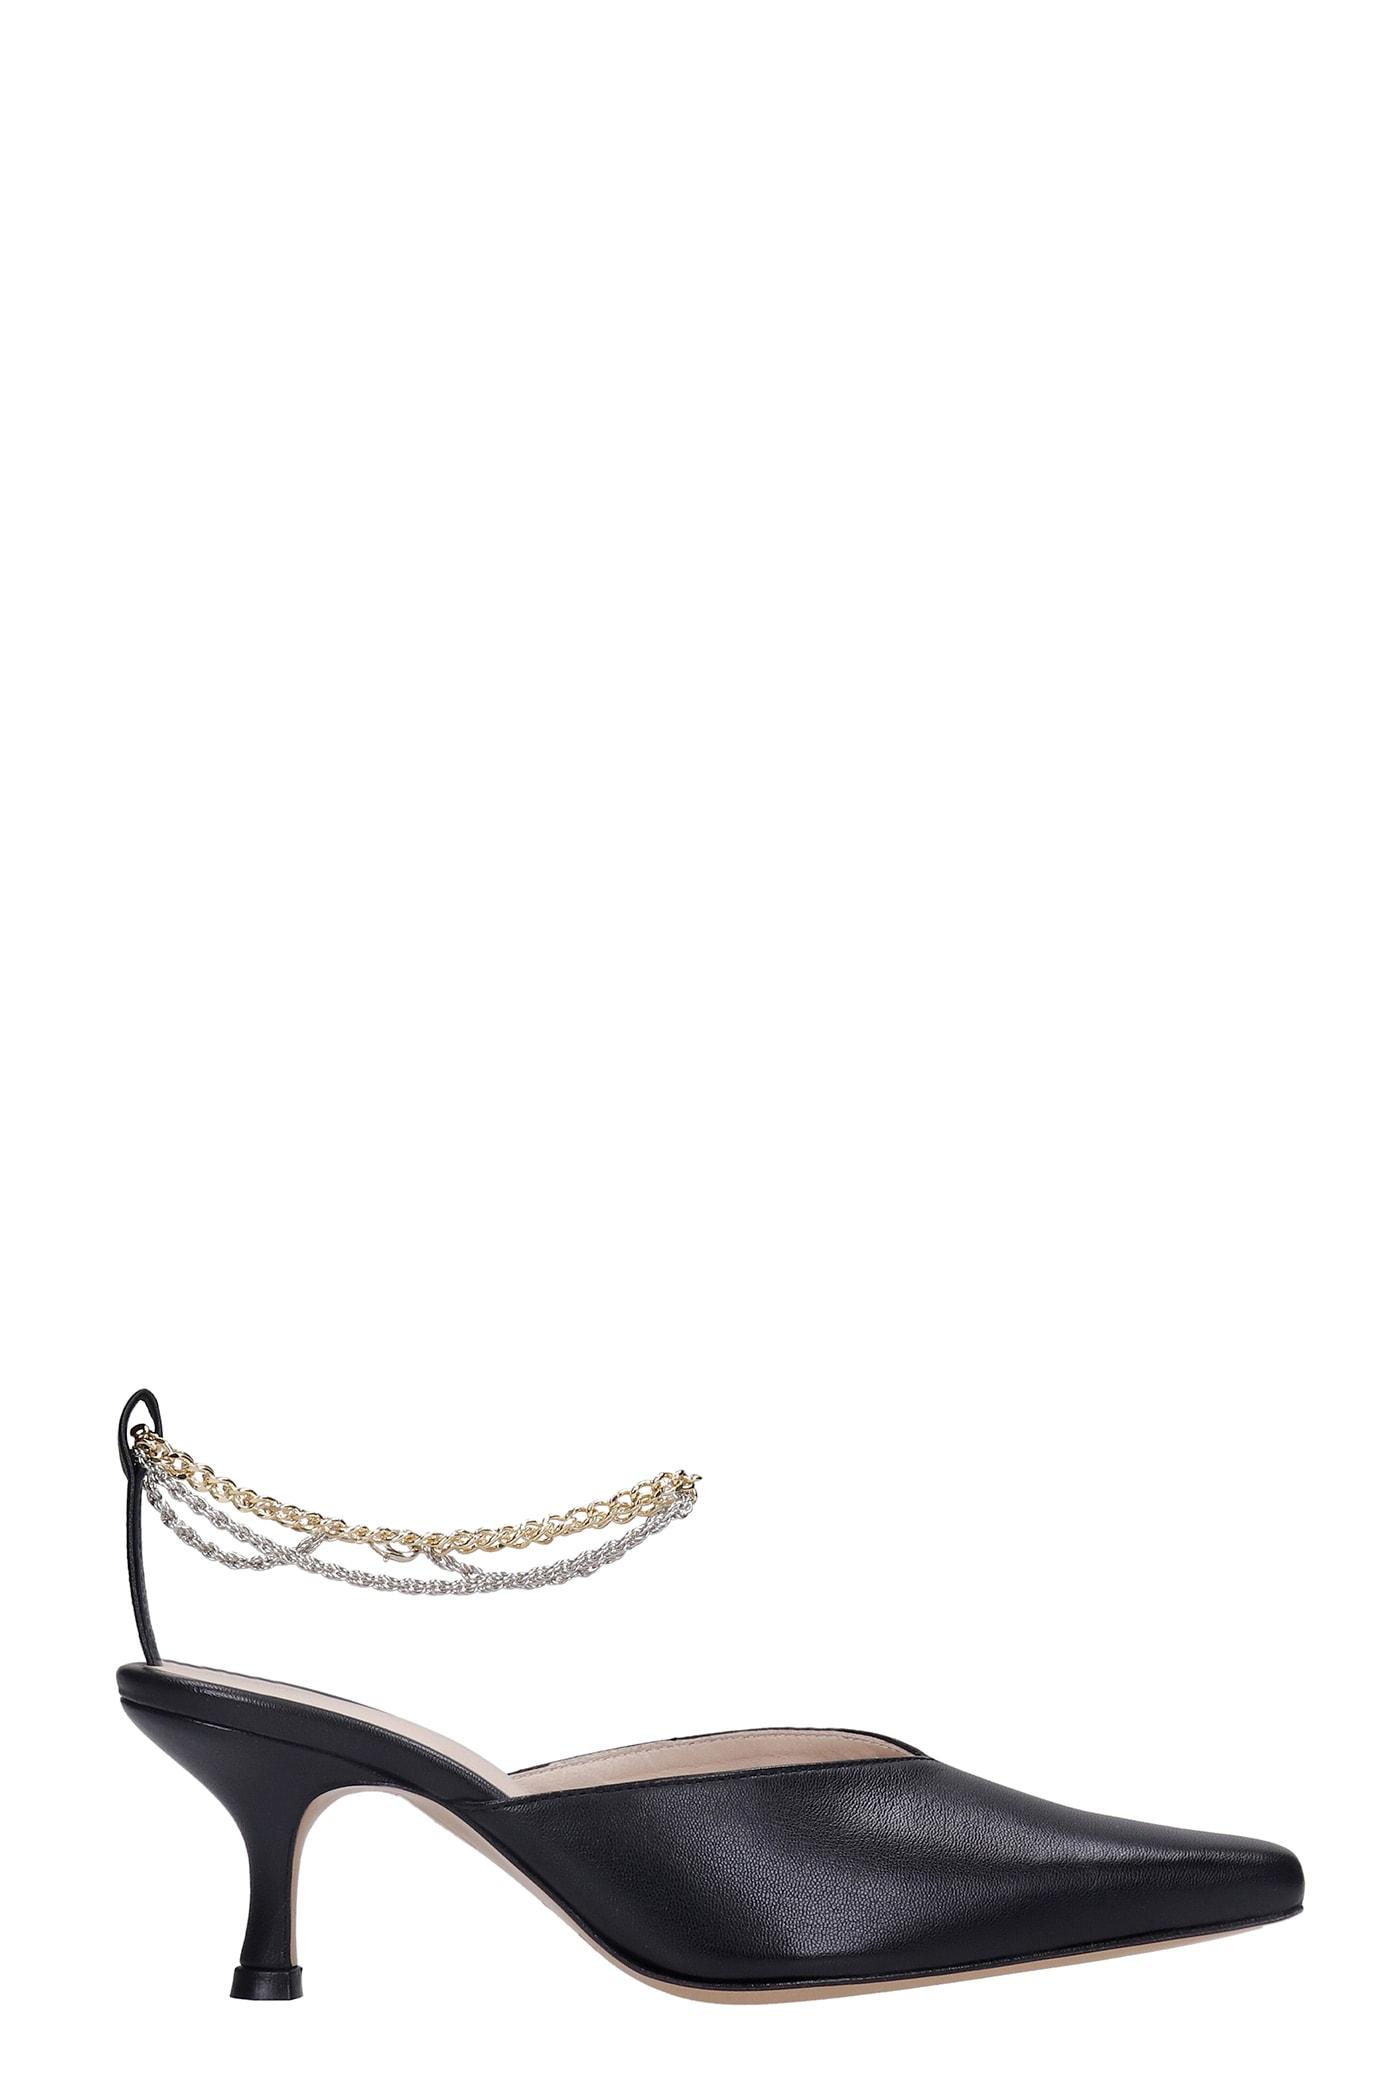 Ara Sandals In Black Leather